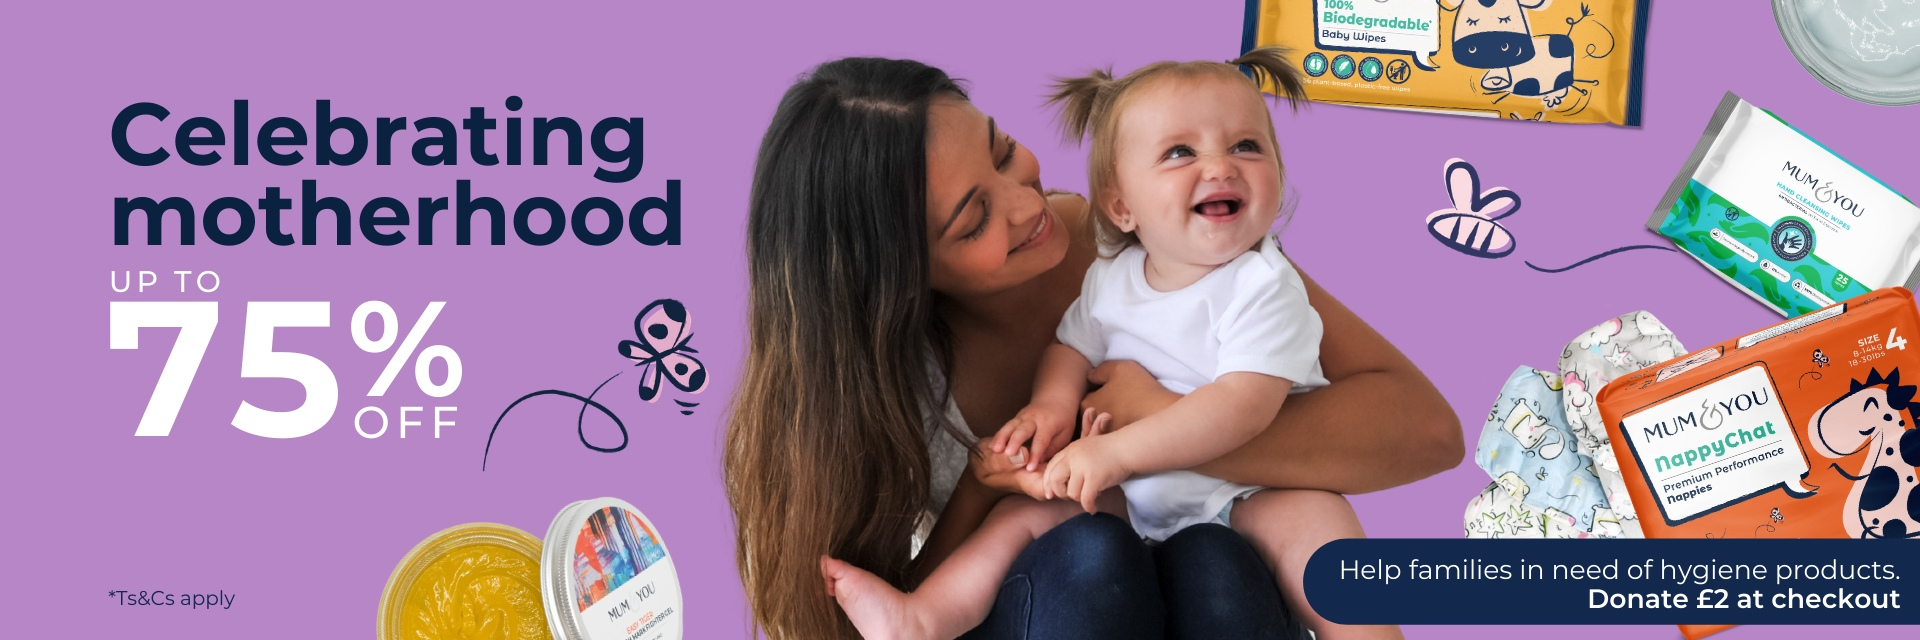 https://d2x0hkmend0gu1.cloudfront.net/pub/media/wysiwyg/IWD_Mothers-Day-Listing-banner.jpg